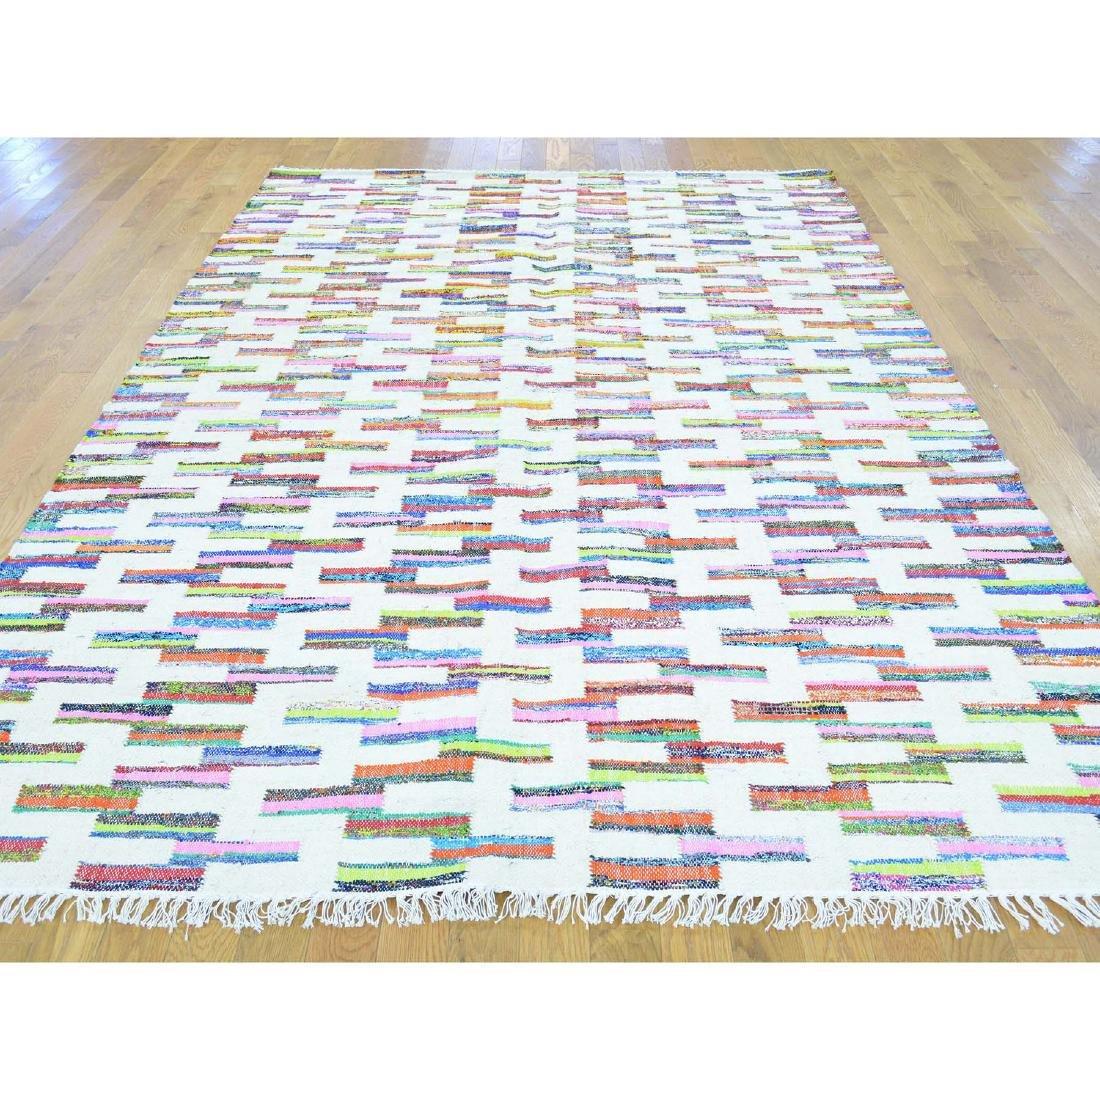 Flat Weave Kilim Hand Woven Oriental Rug 6x9.1 - 2